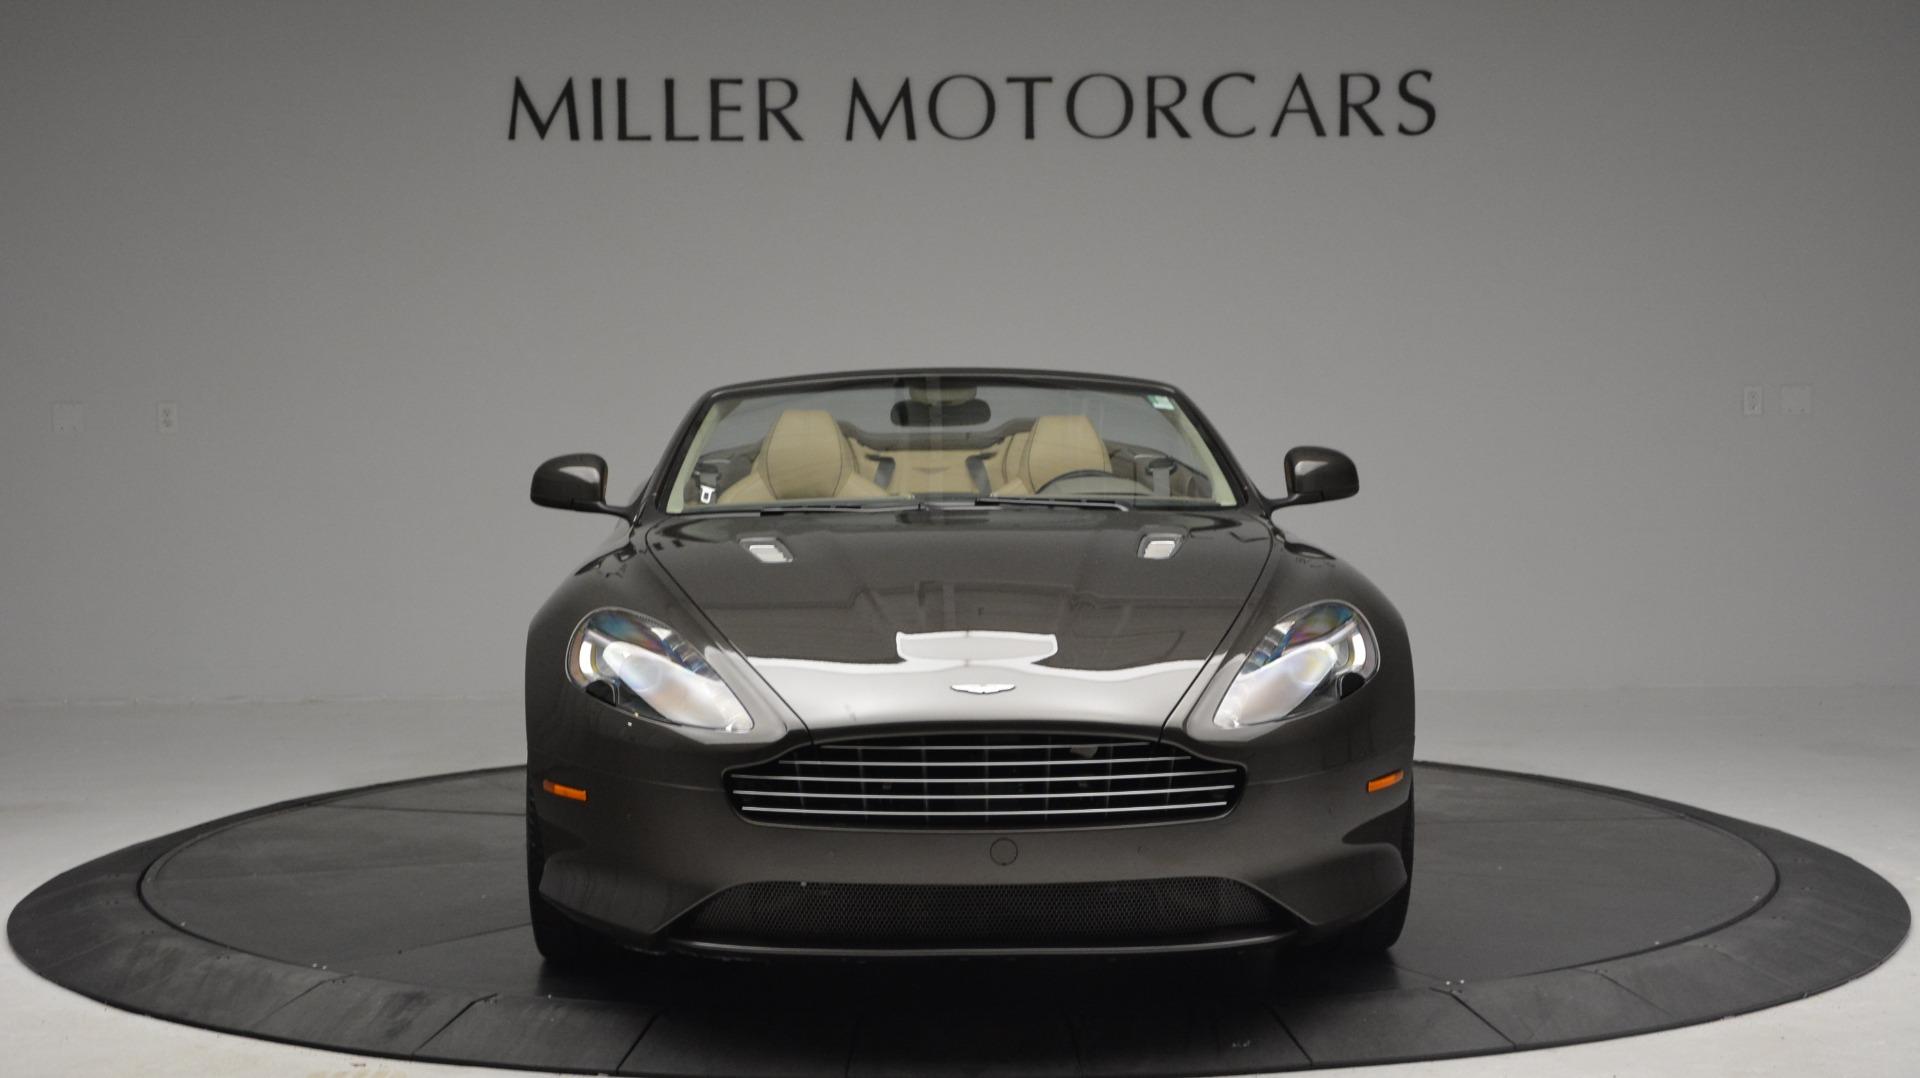 Used 2012 Aston Martin Virage Convertible For Sale In Greenwich, CT. Alfa Romeo of Greenwich, 7613 3351_p12